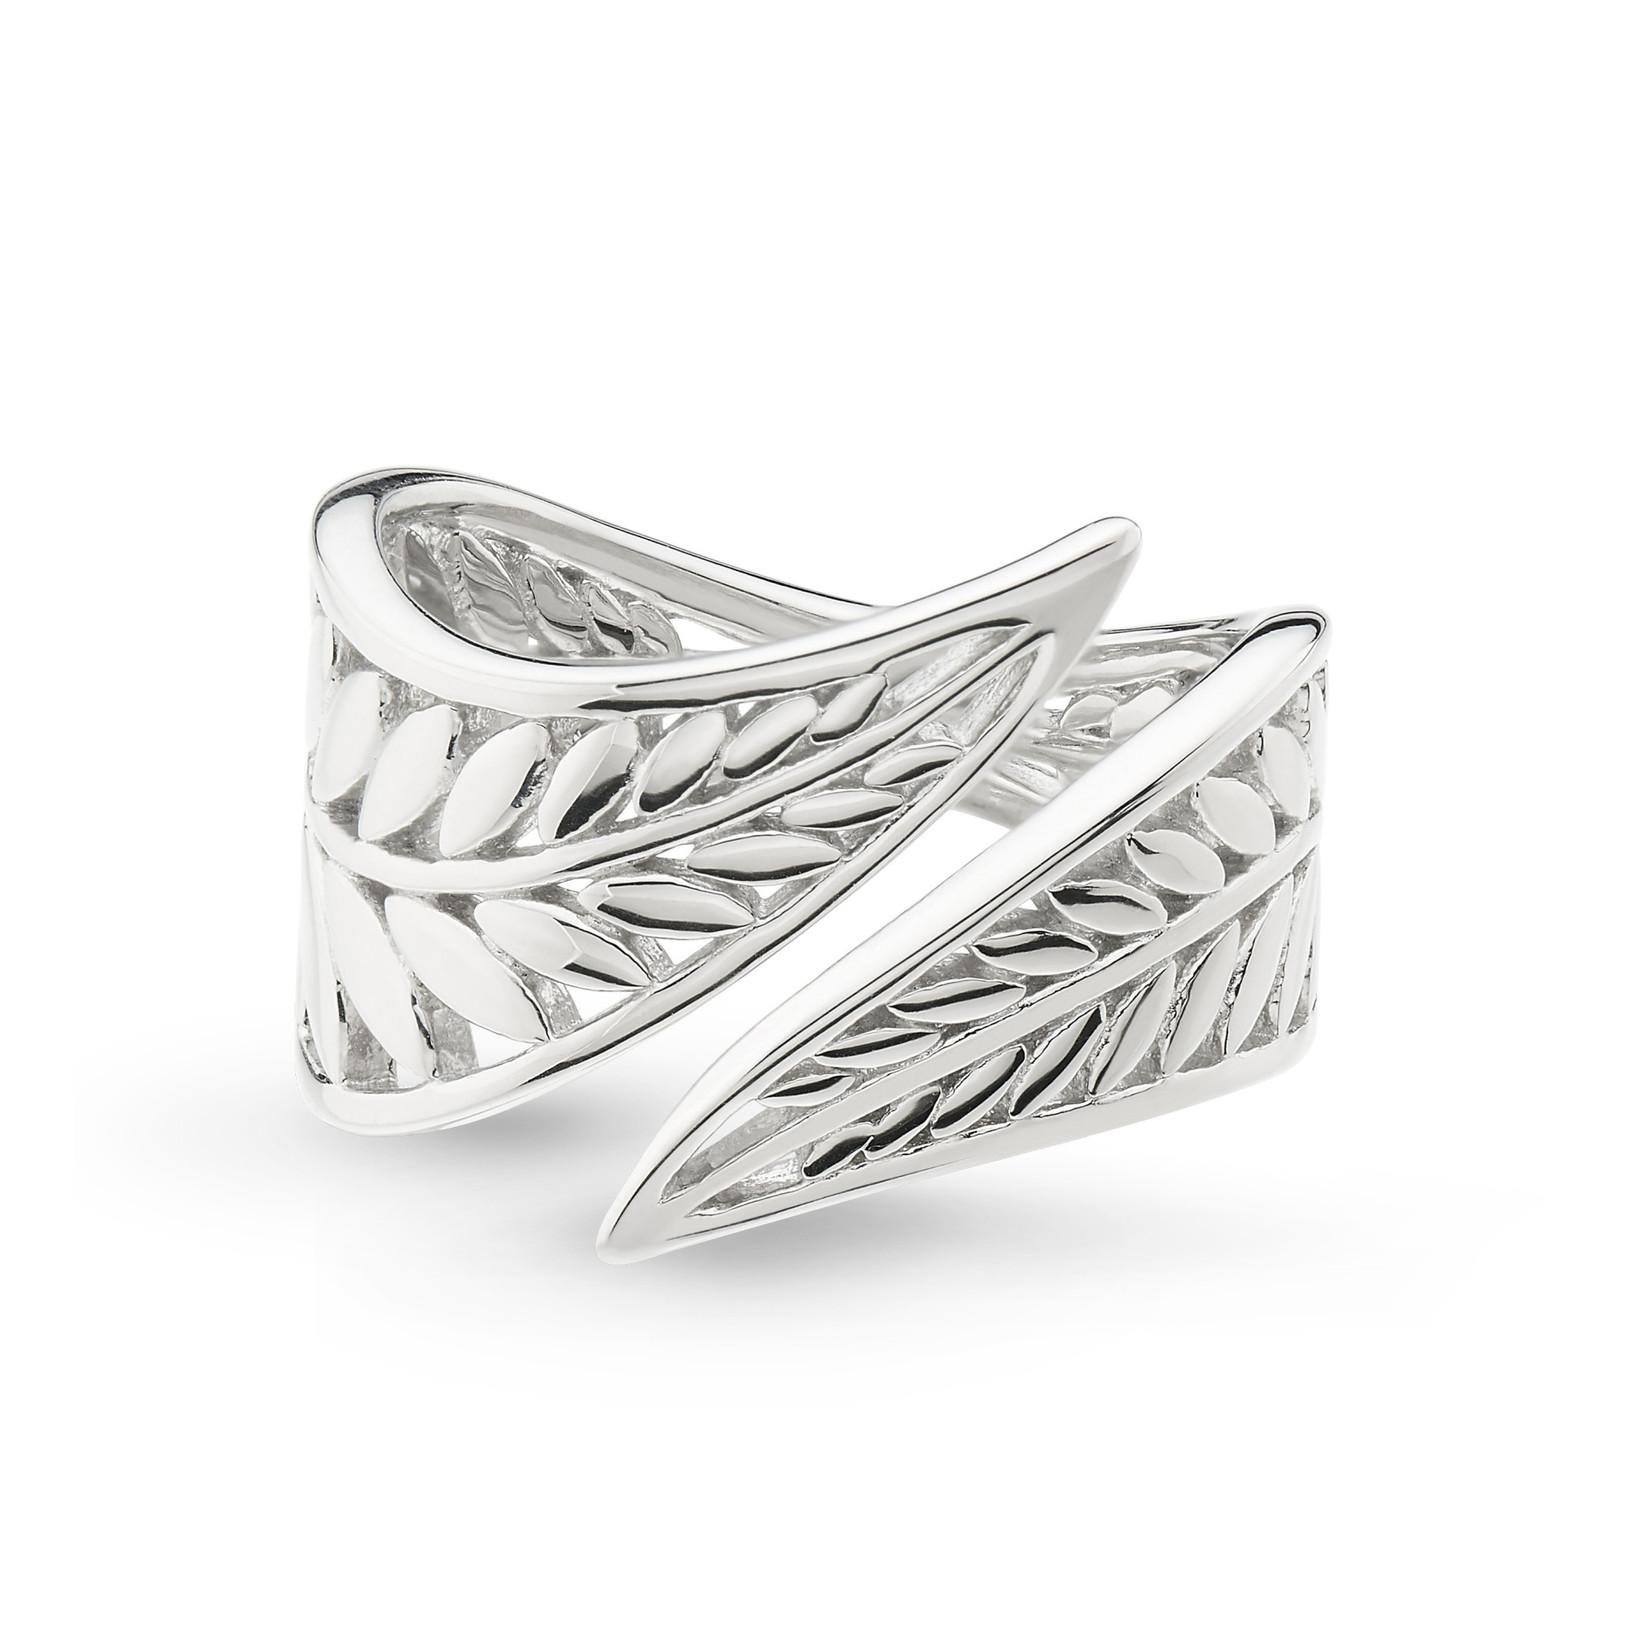 Blossom Eden RP Wrapped Leaf Ring